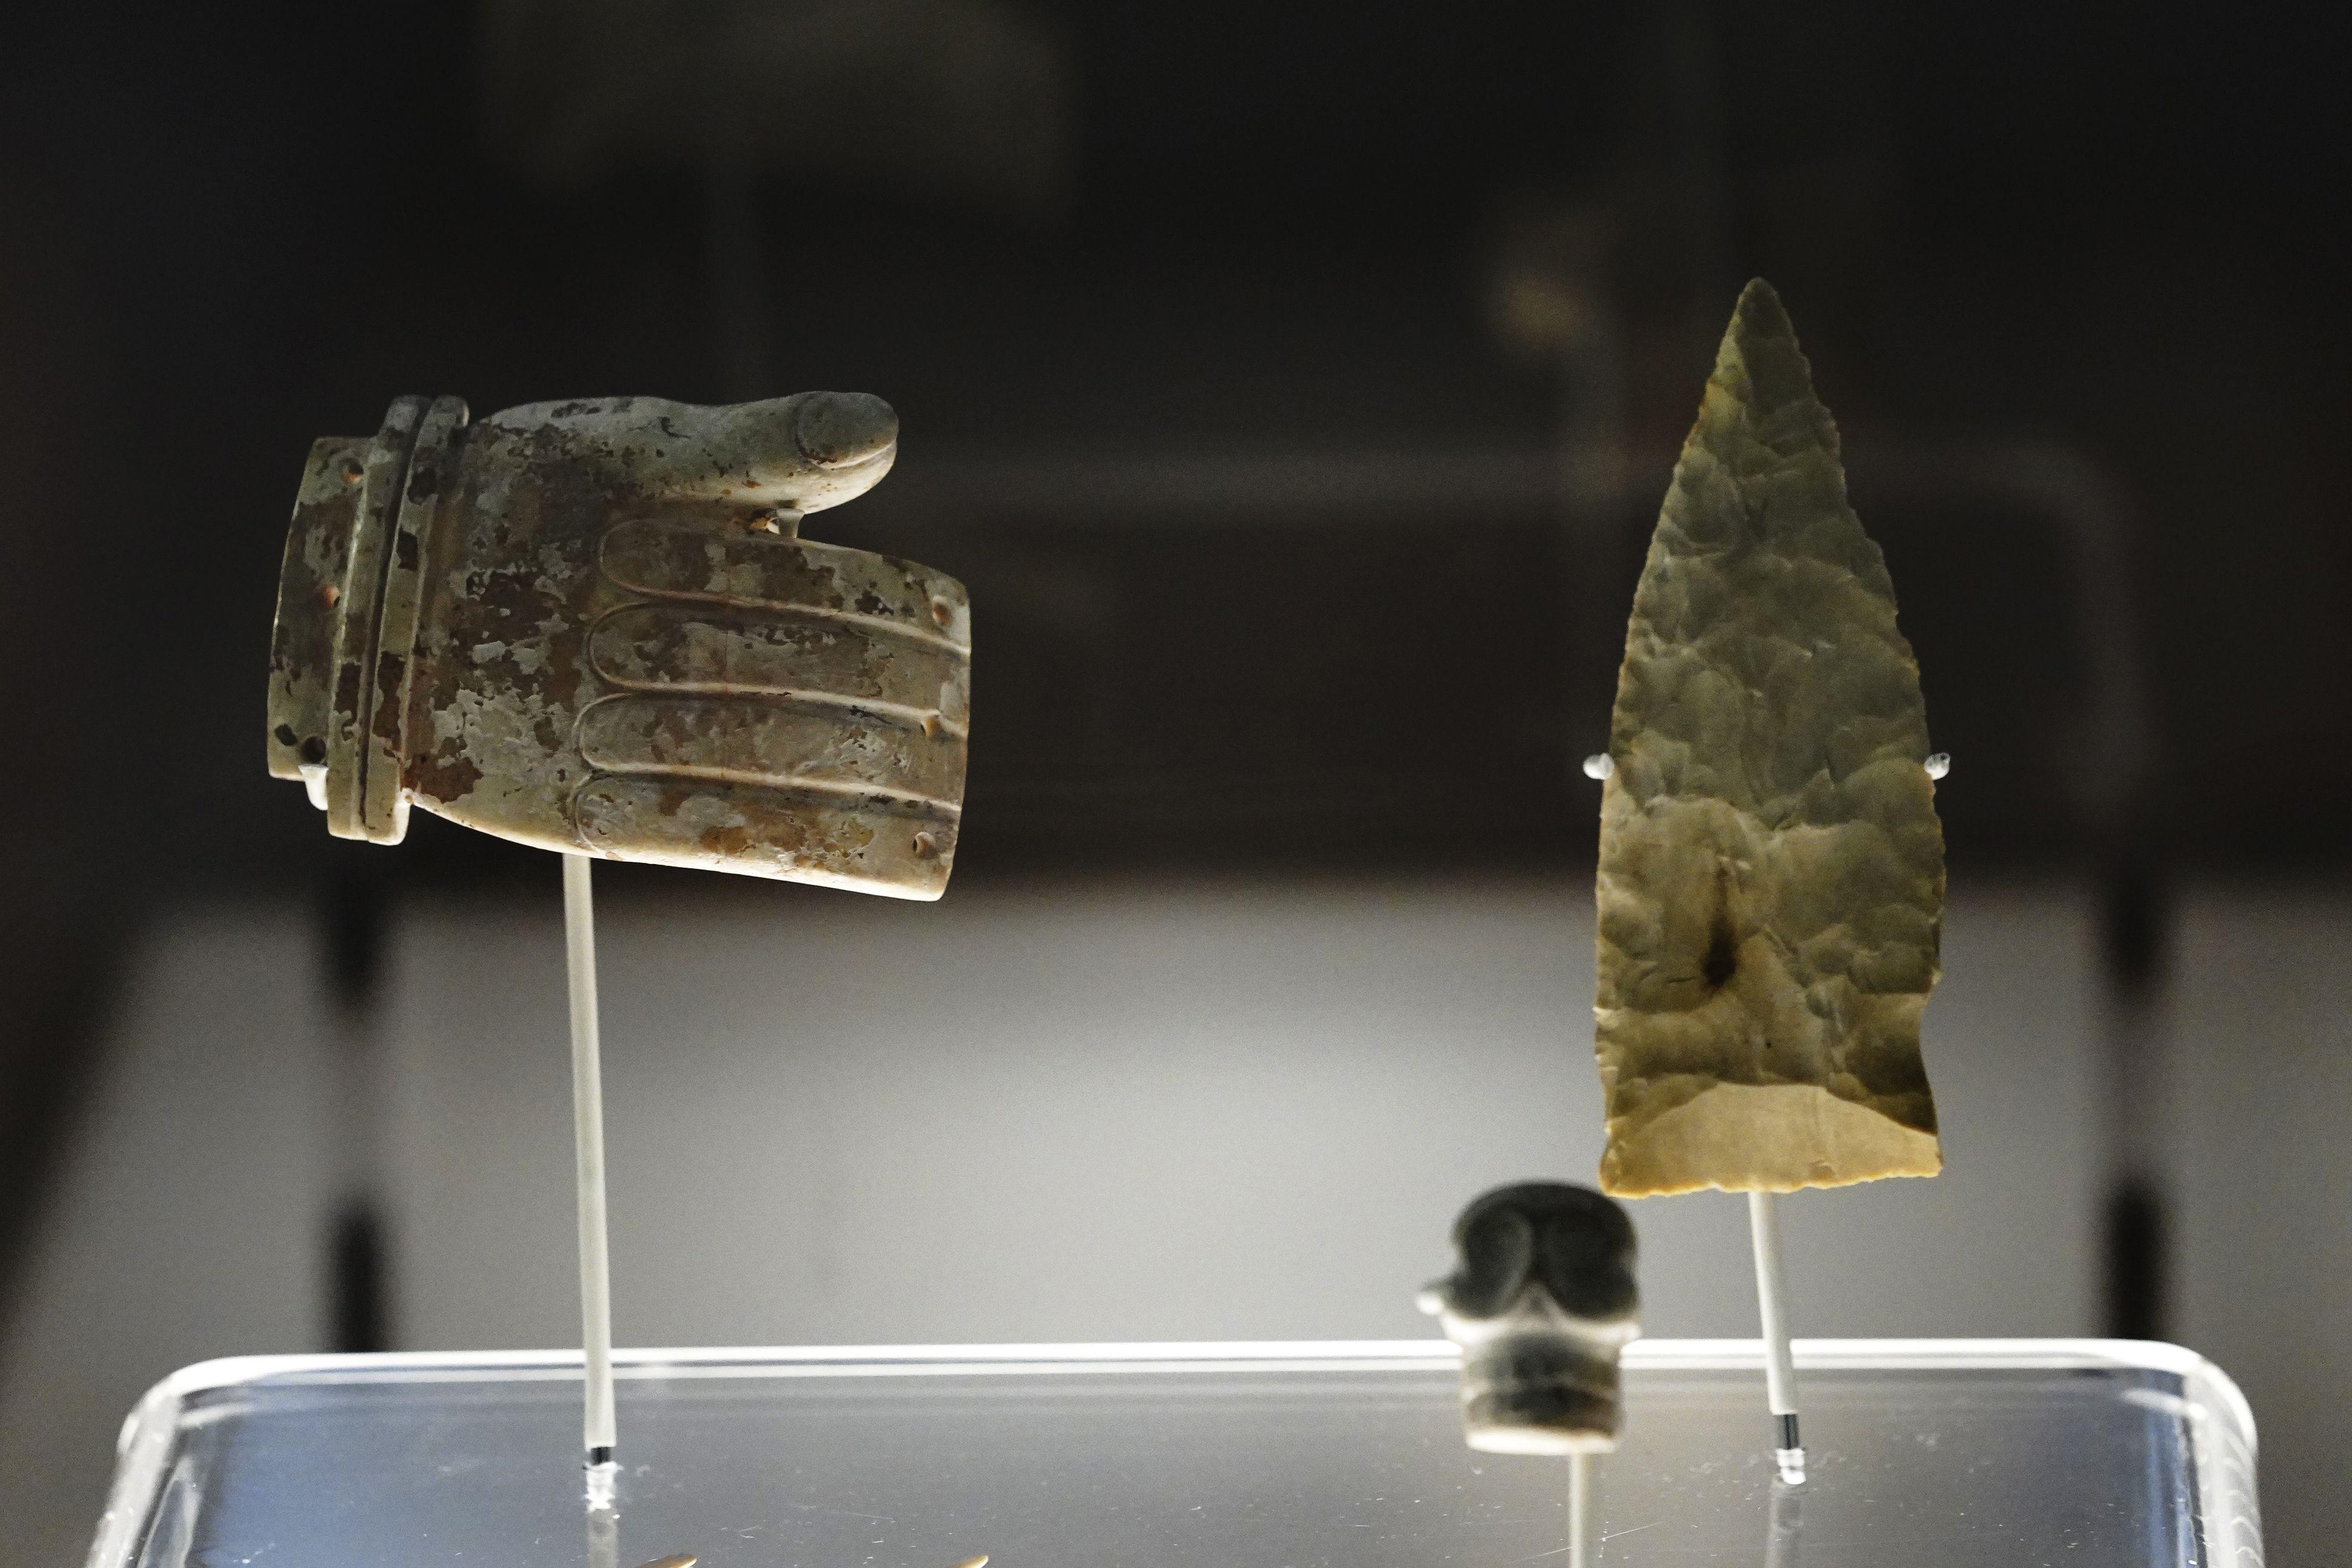 mexico luce piezas prehispanicas recuperadas del extranjero